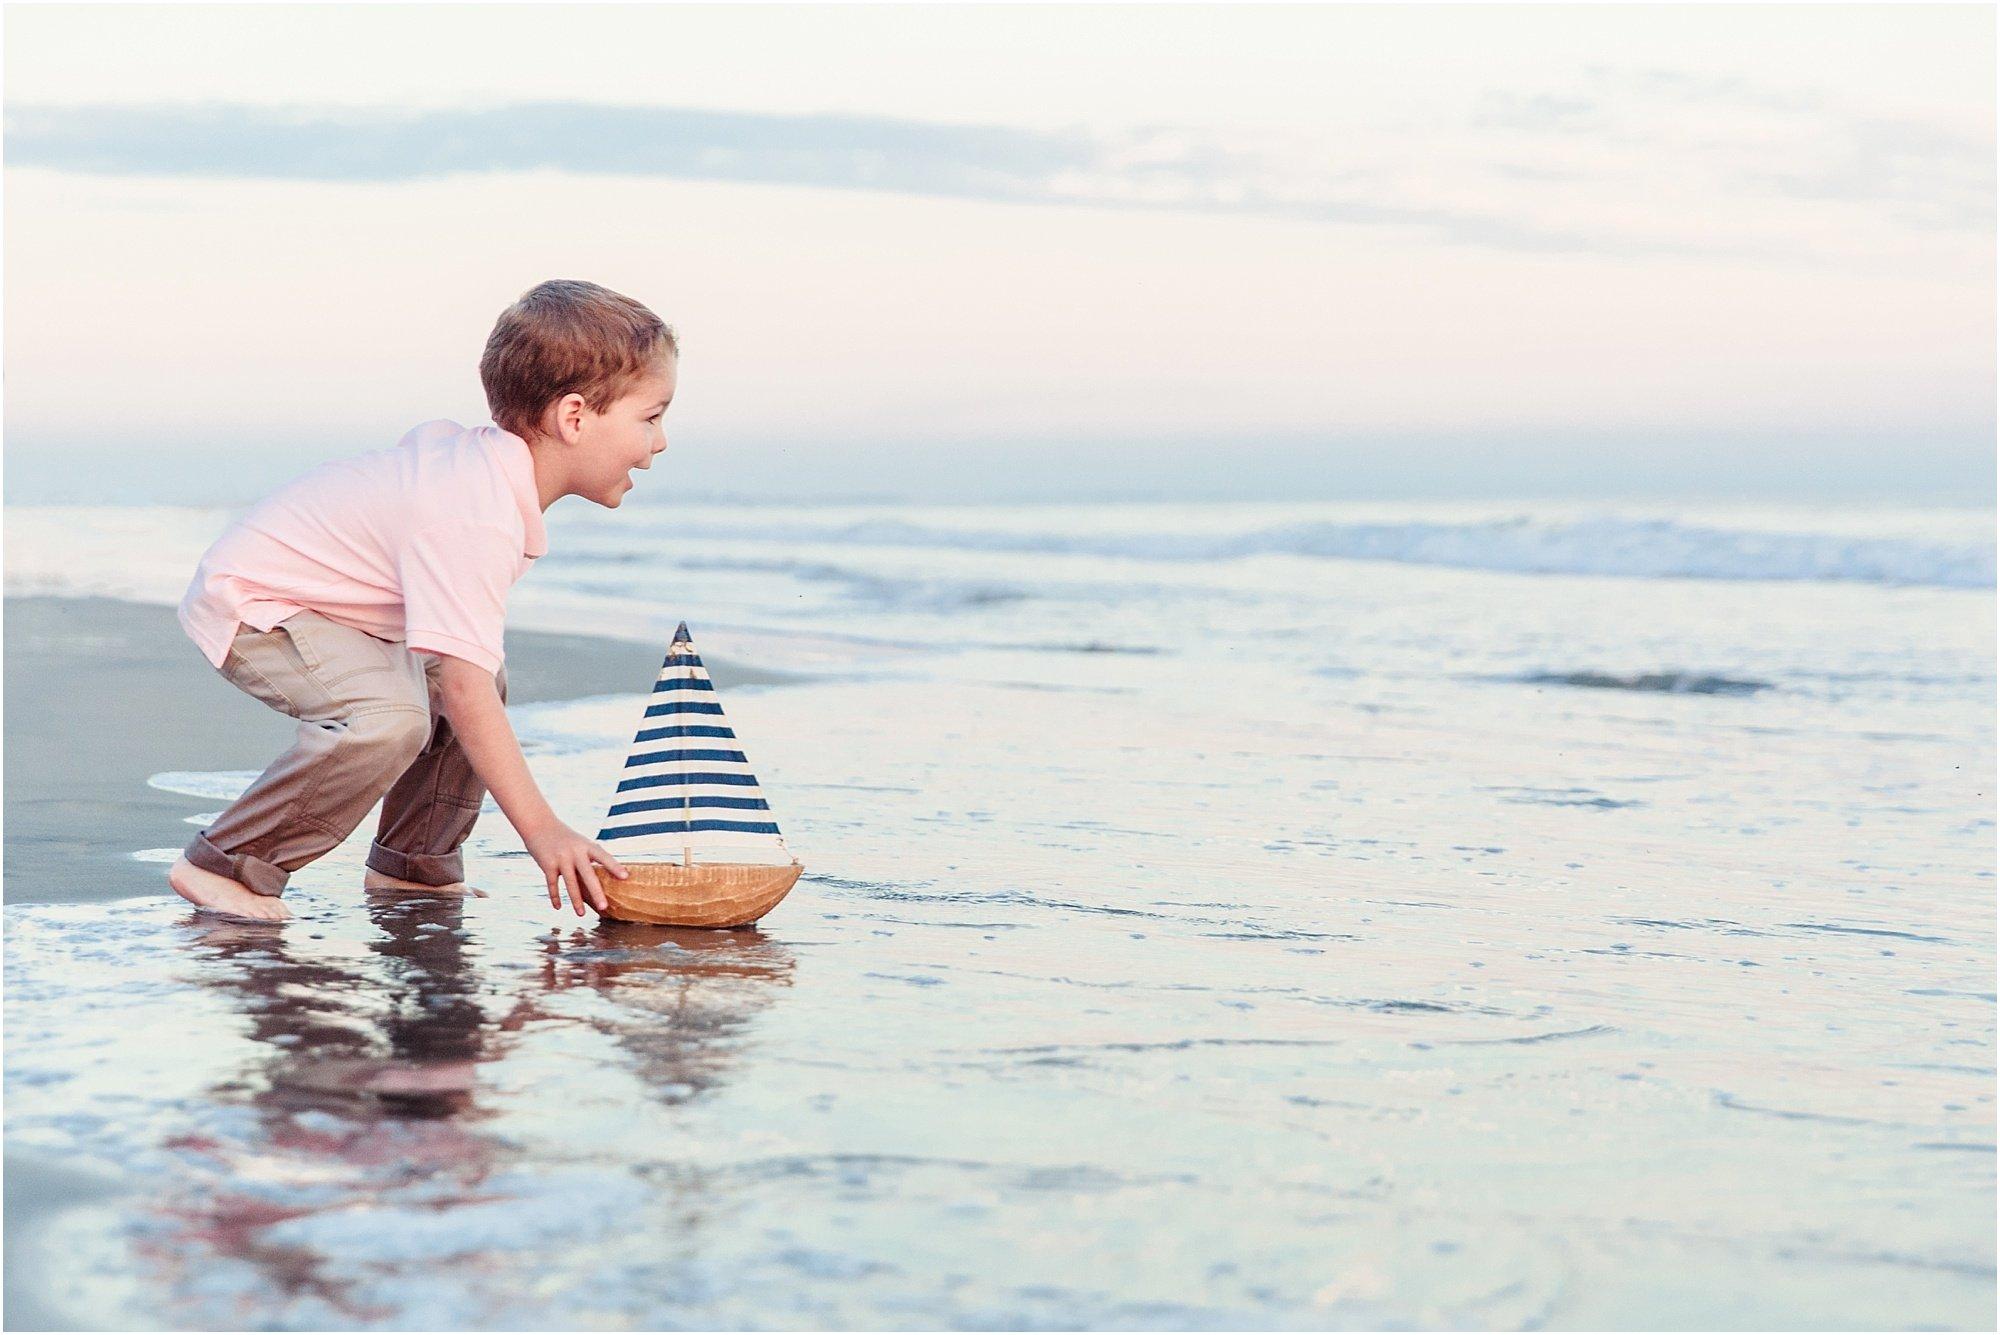 Hotel del Coronado Beach Photography | Family Portraits on the Beach